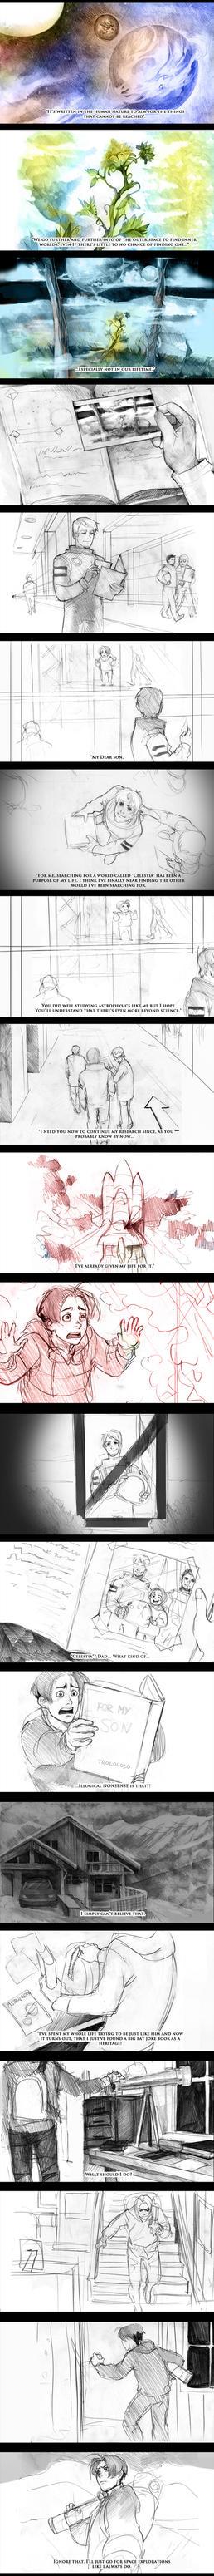 Far Beyond the World Trailer storyboard 1 by Lapis-Razuri